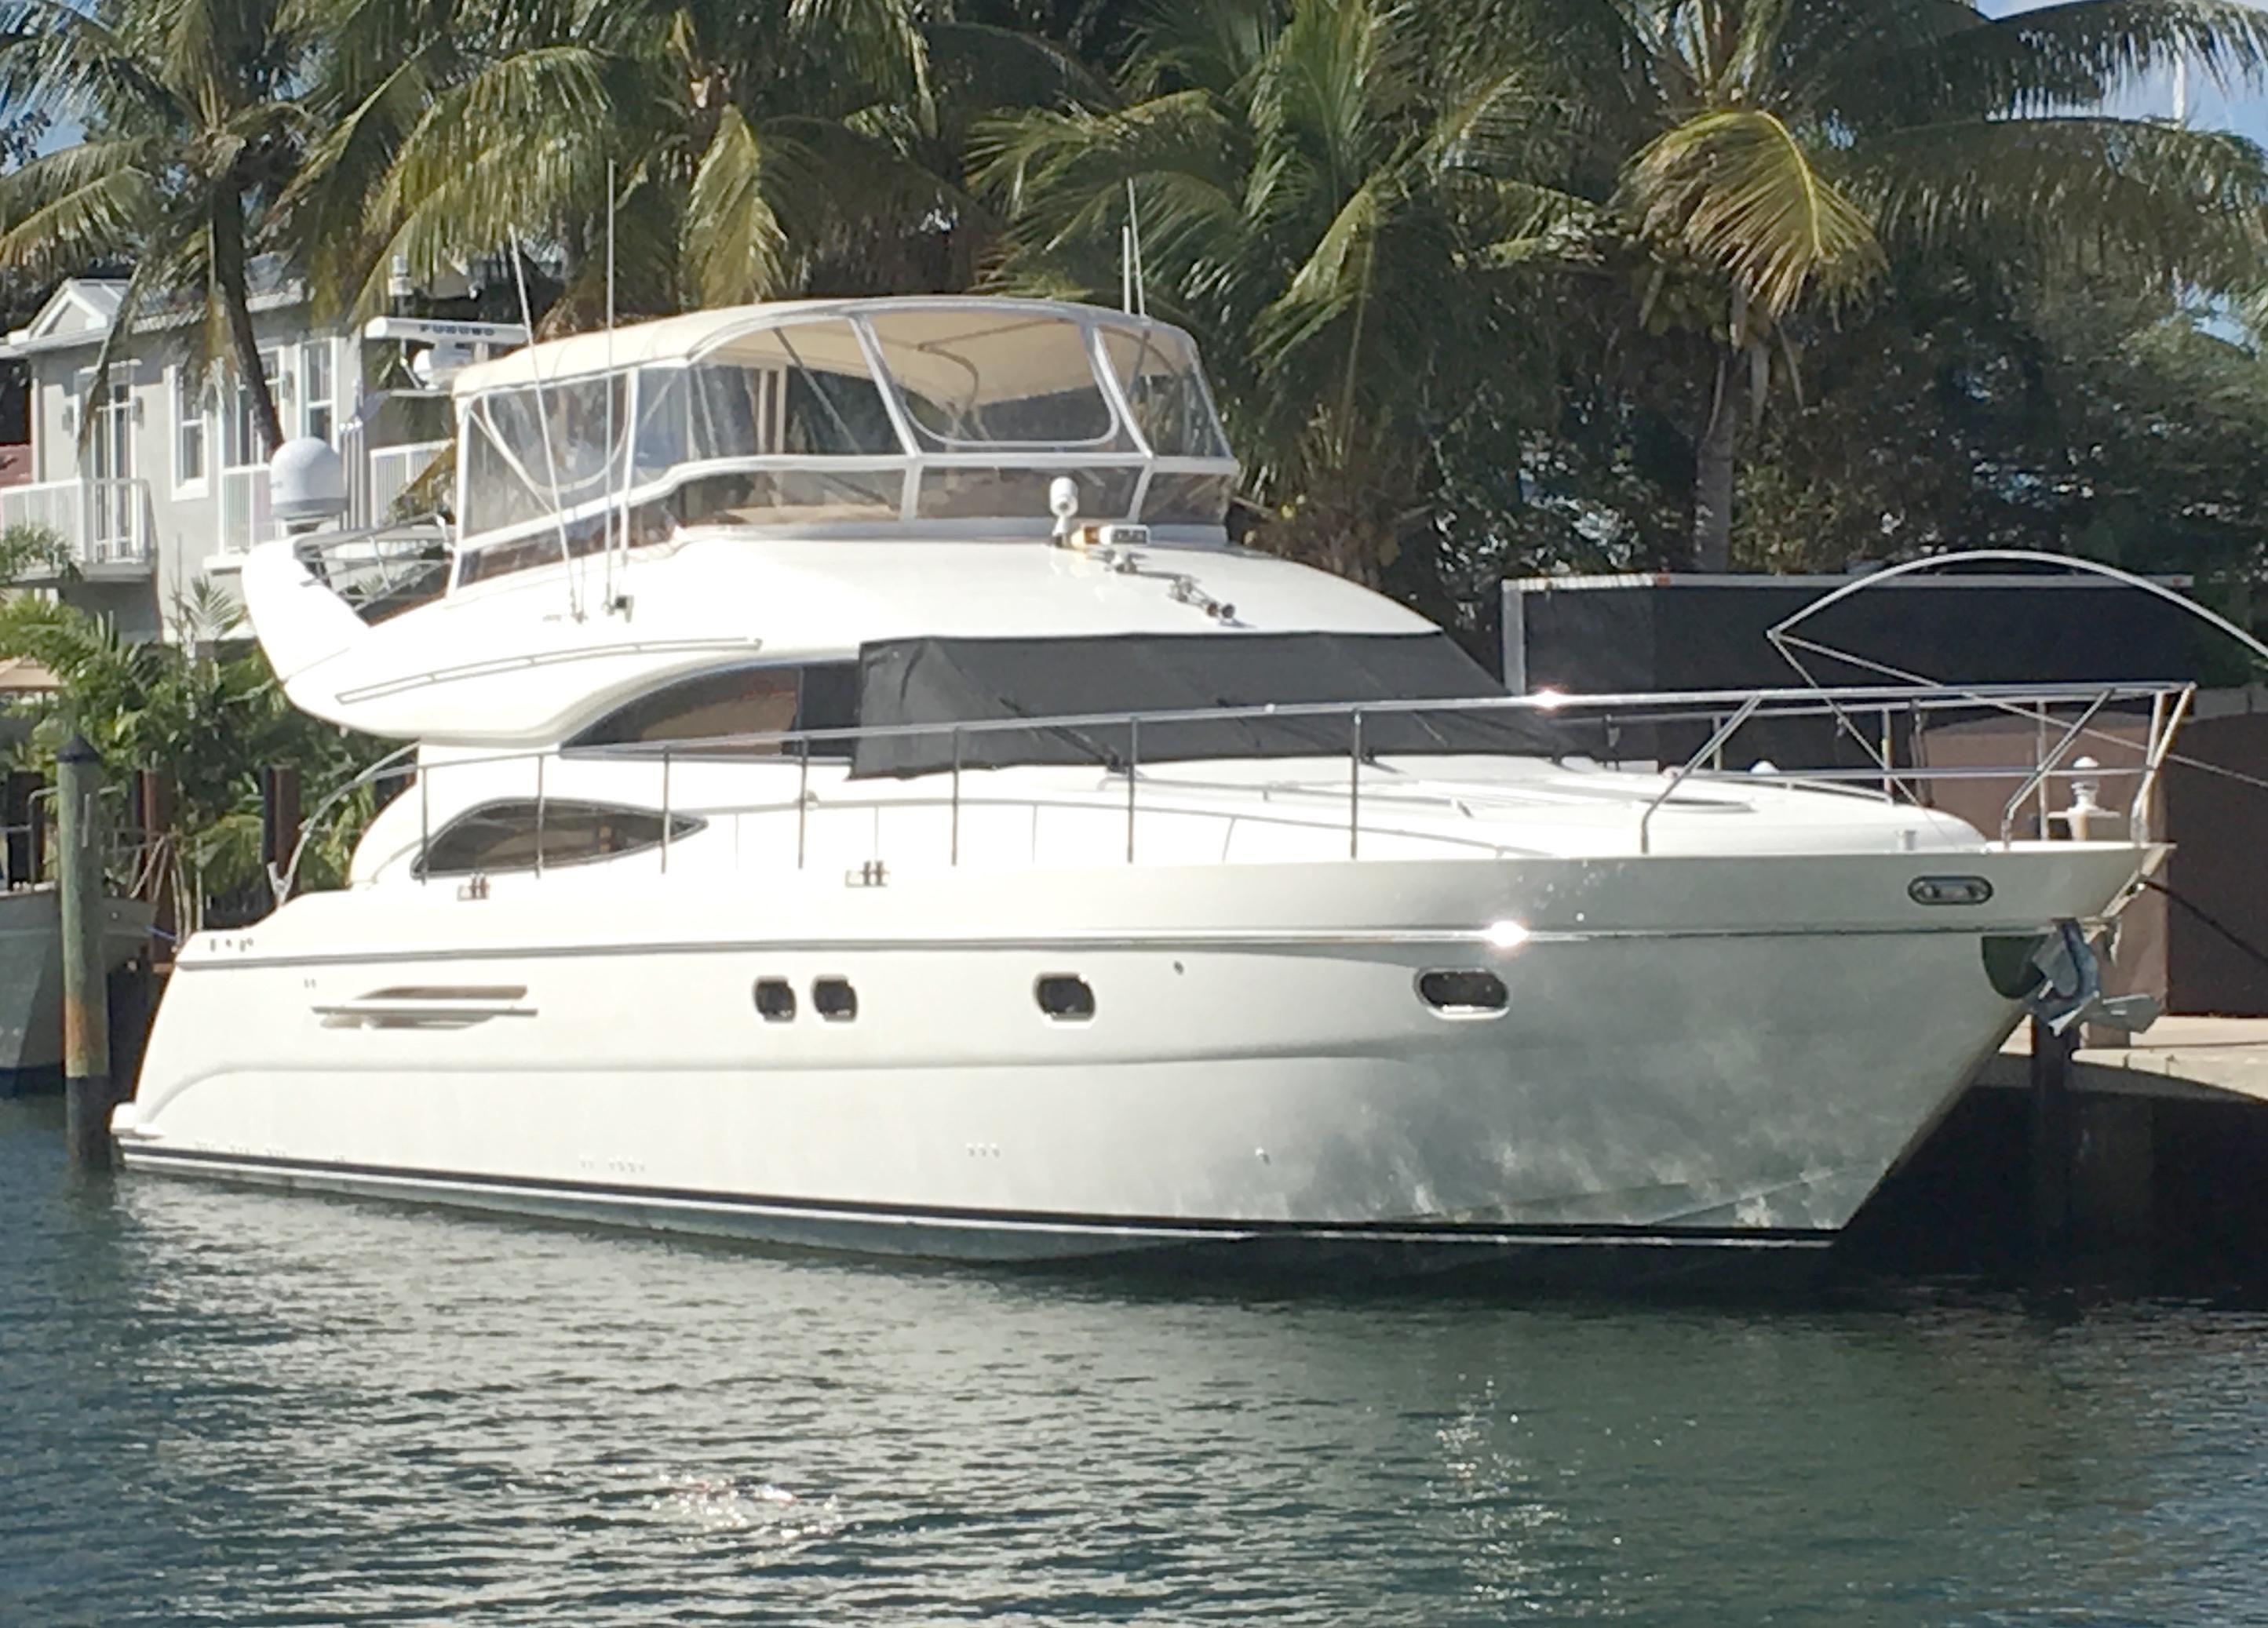 2004 viking princess 61 motor yacht power boat for sale for 85 viking motor yacht